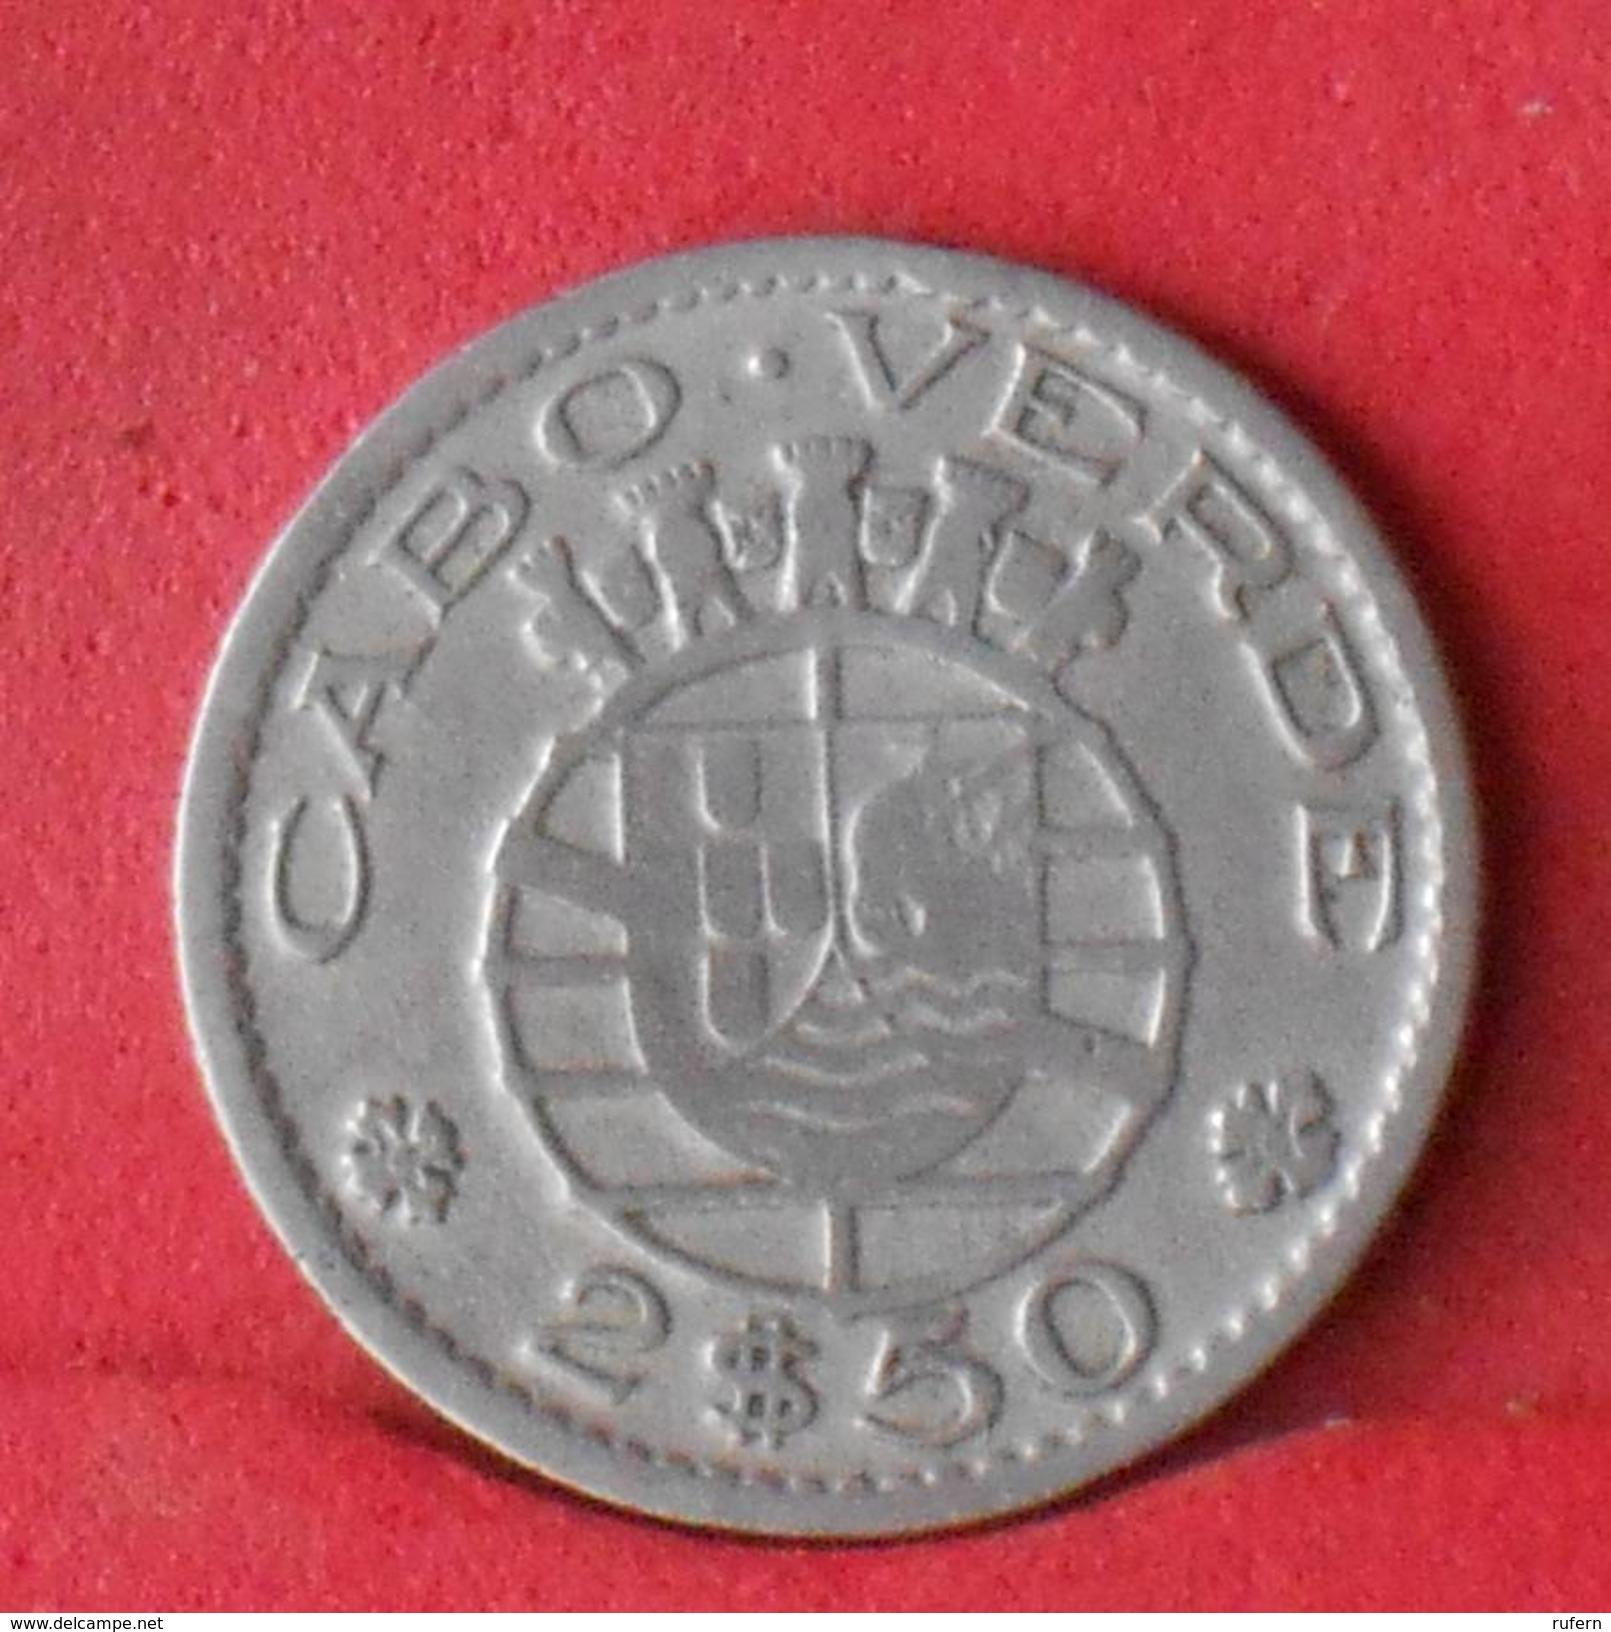 CAPE VERDE 2,5 ESCUDOS 1953 -    KM# 9 - (Nº17955) - Cap Vert